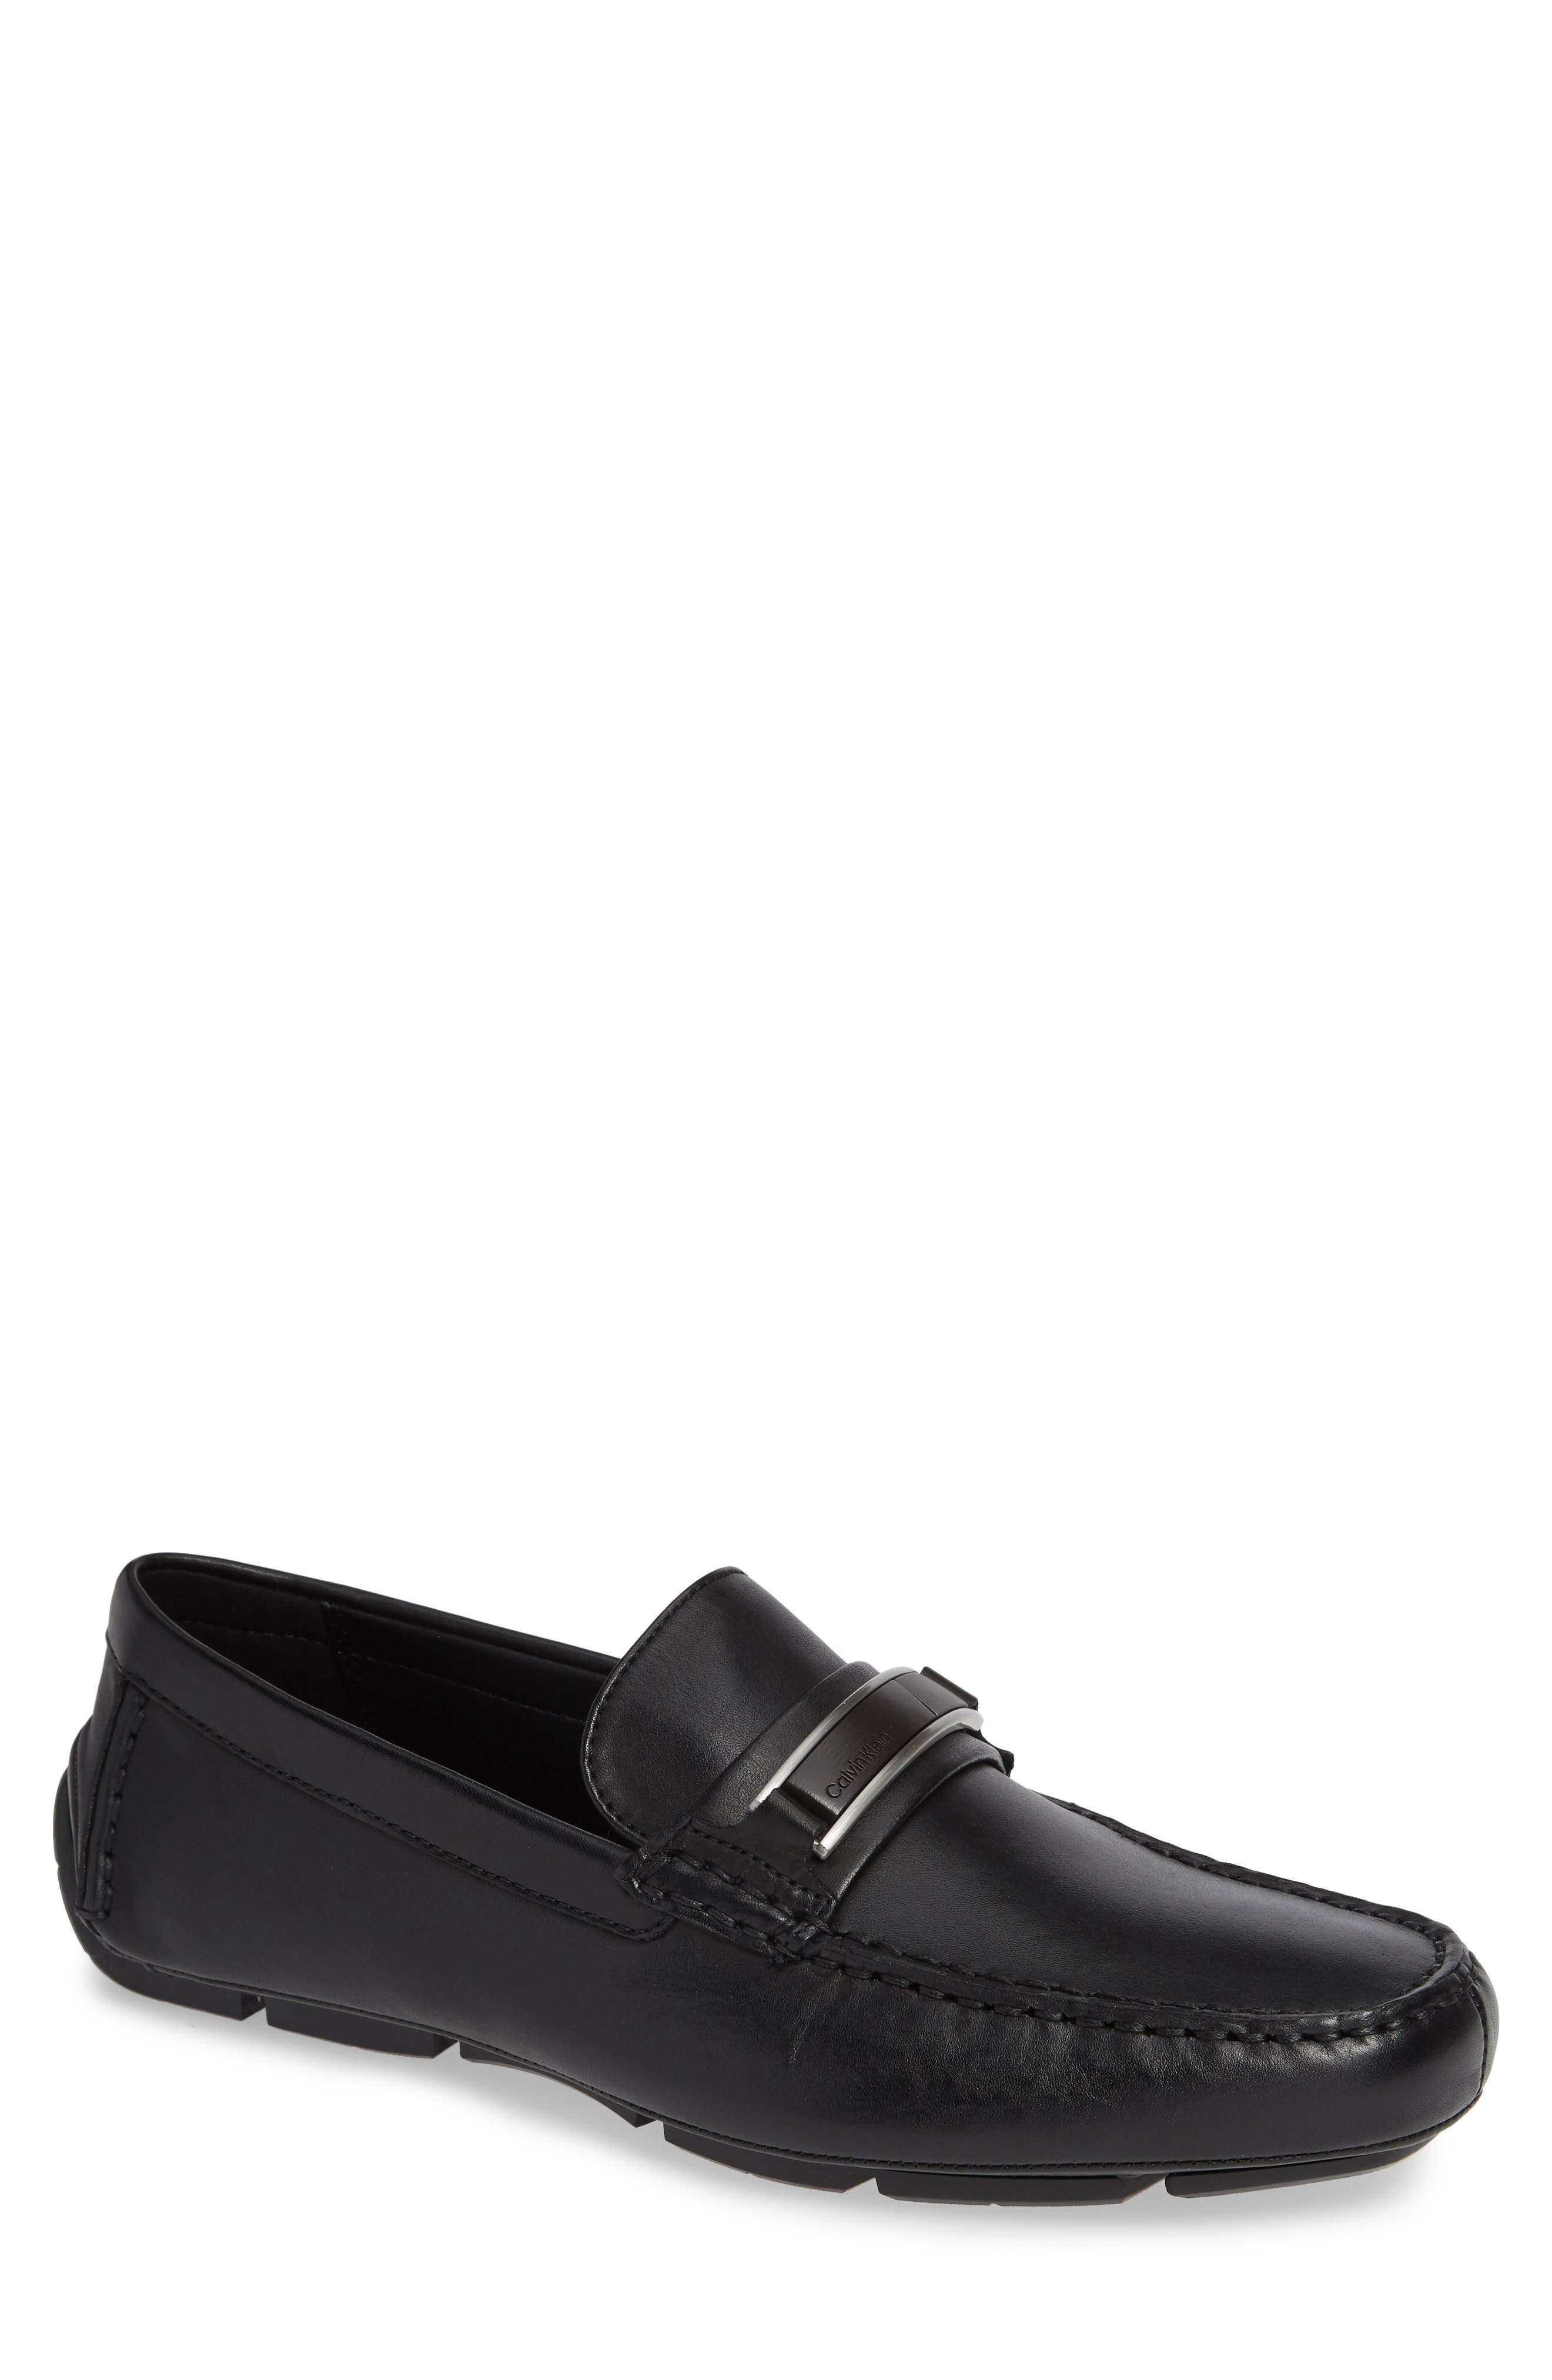 Kadison Buckle Driving Shoe,                         Main,                         color, BLACK LEATHER